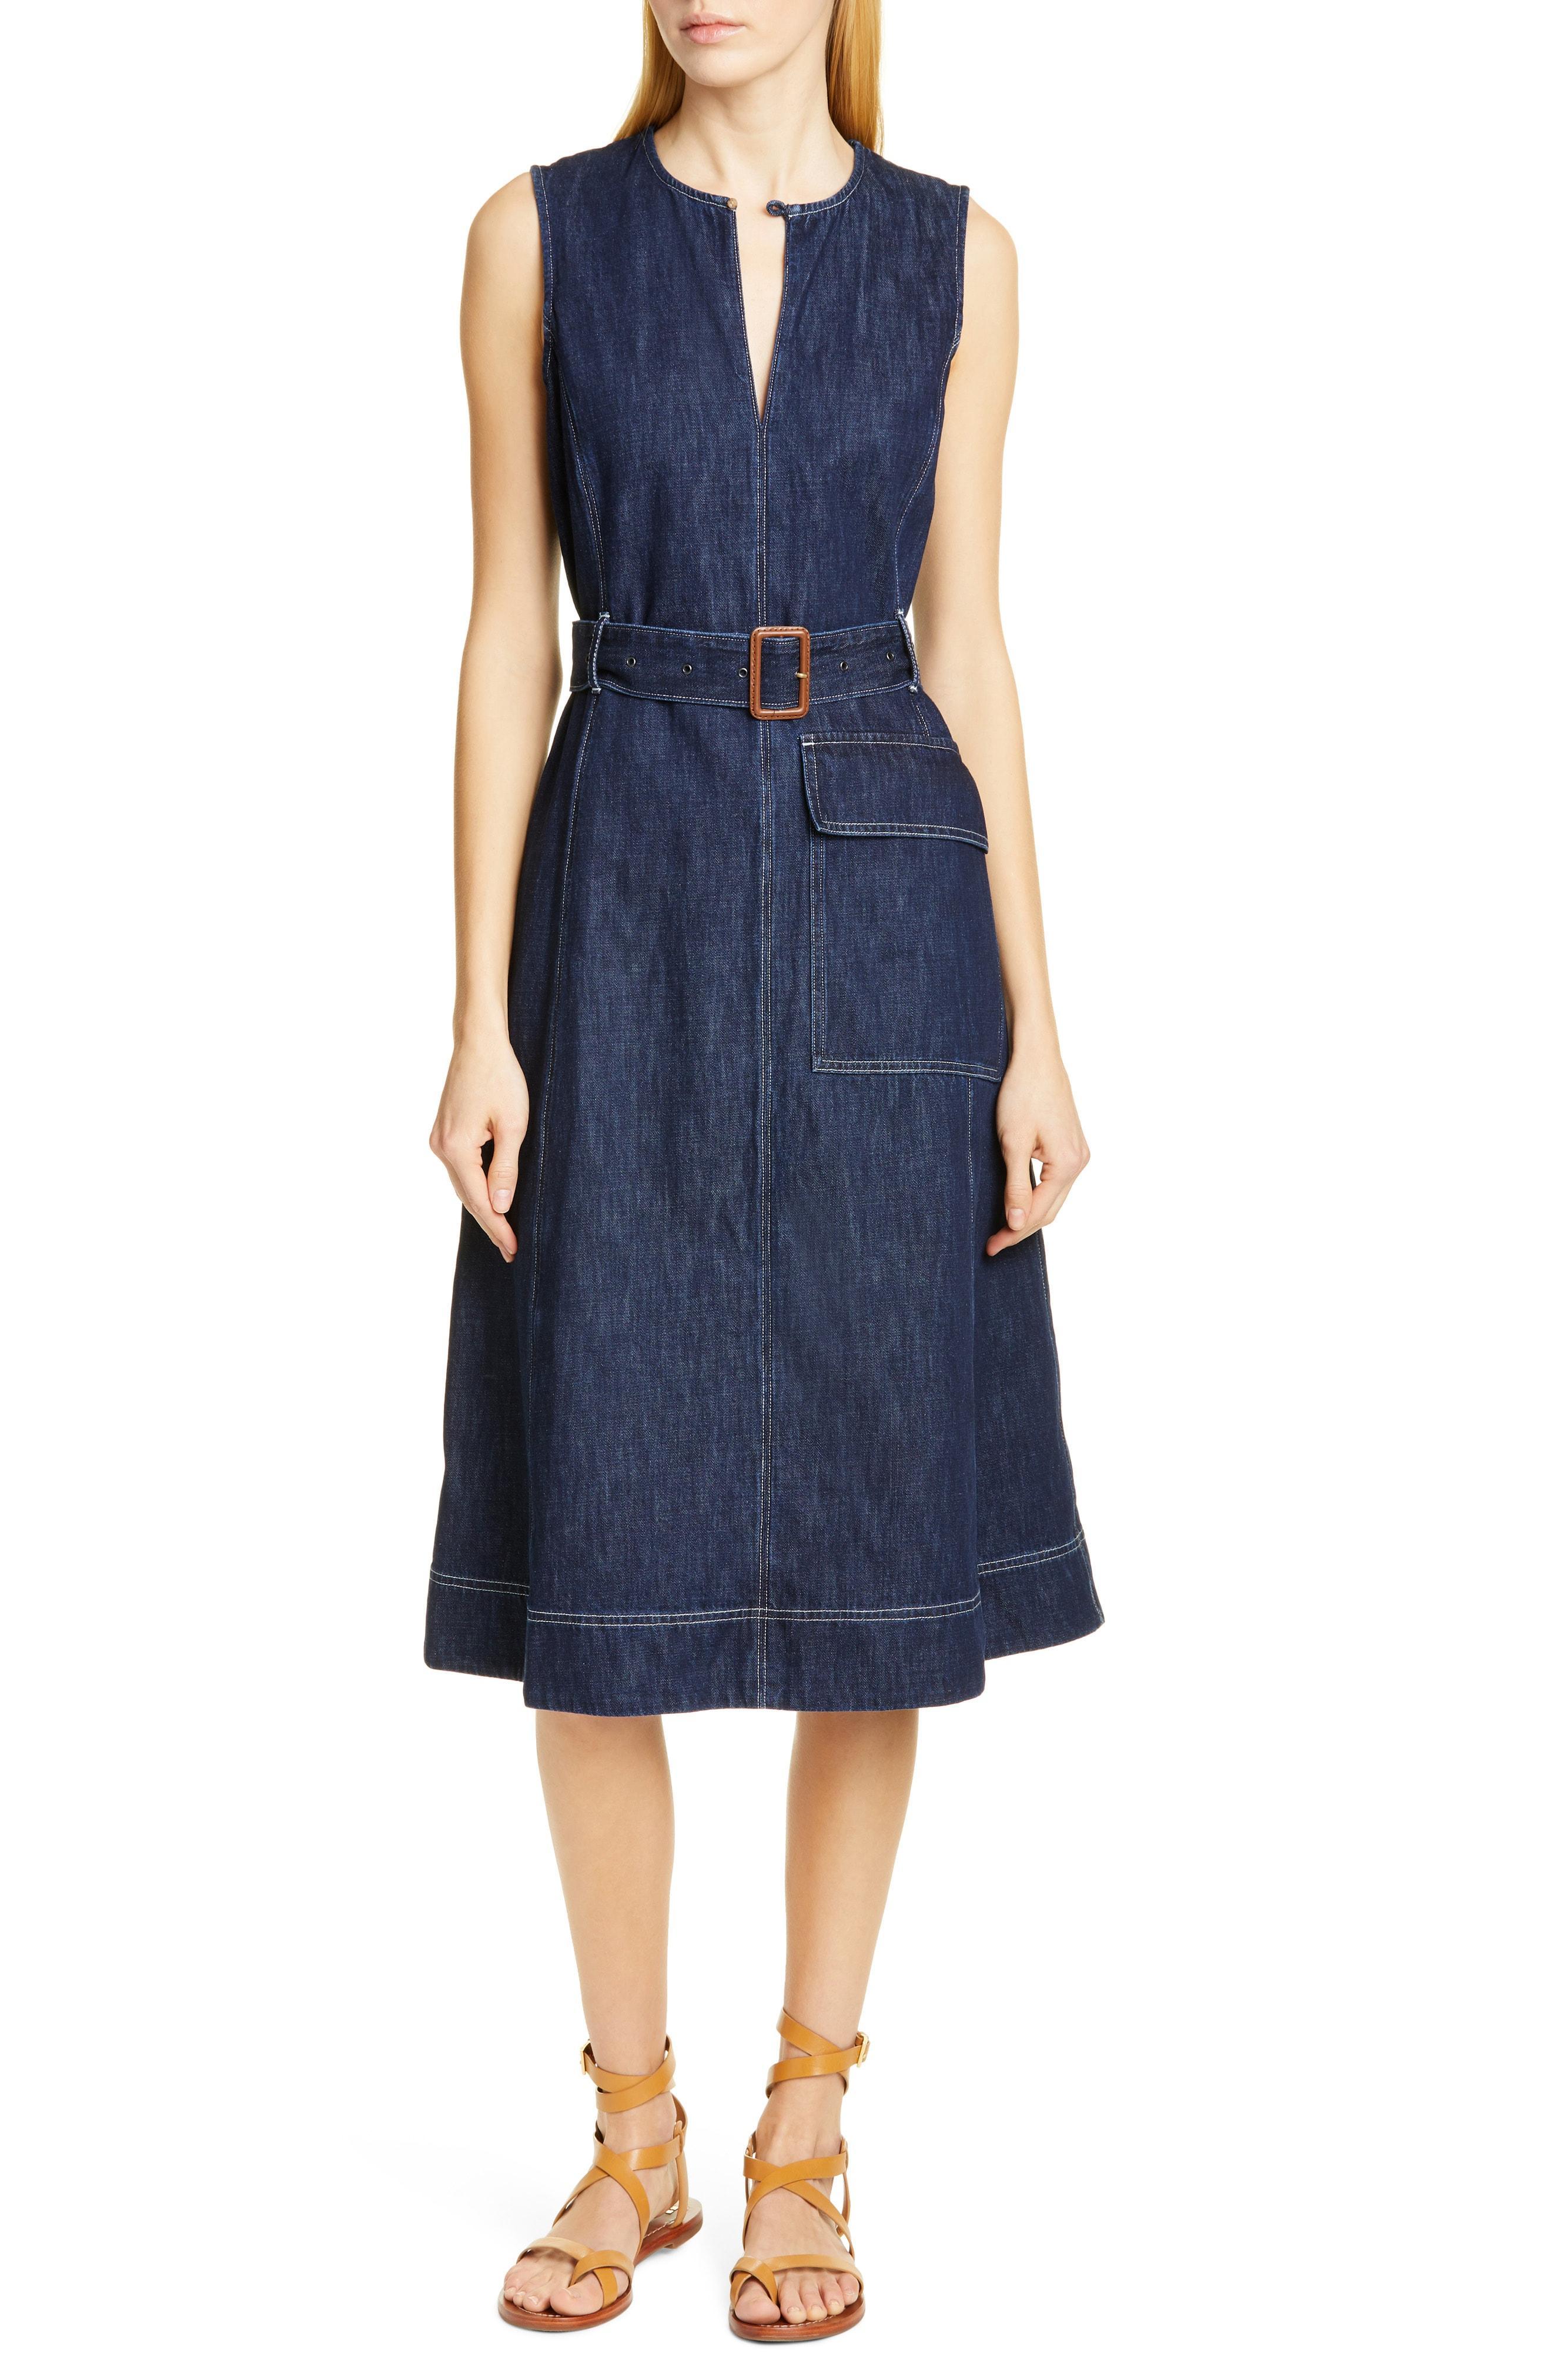 475a26bc5d Lyst - Polo Ralph Lauren Bevlry Denim Midi Dress in Blue